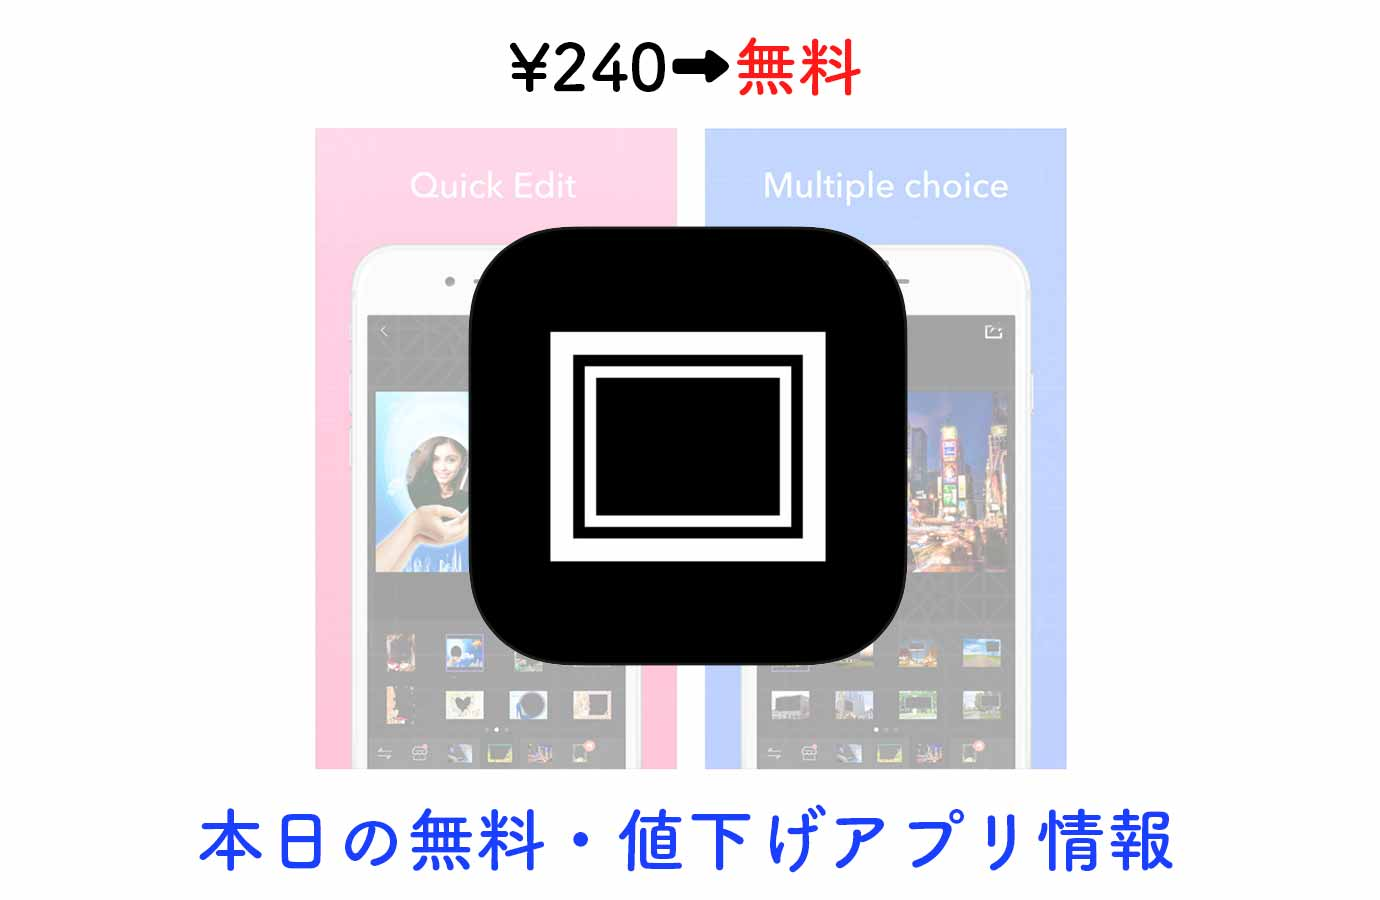 Appsale0828